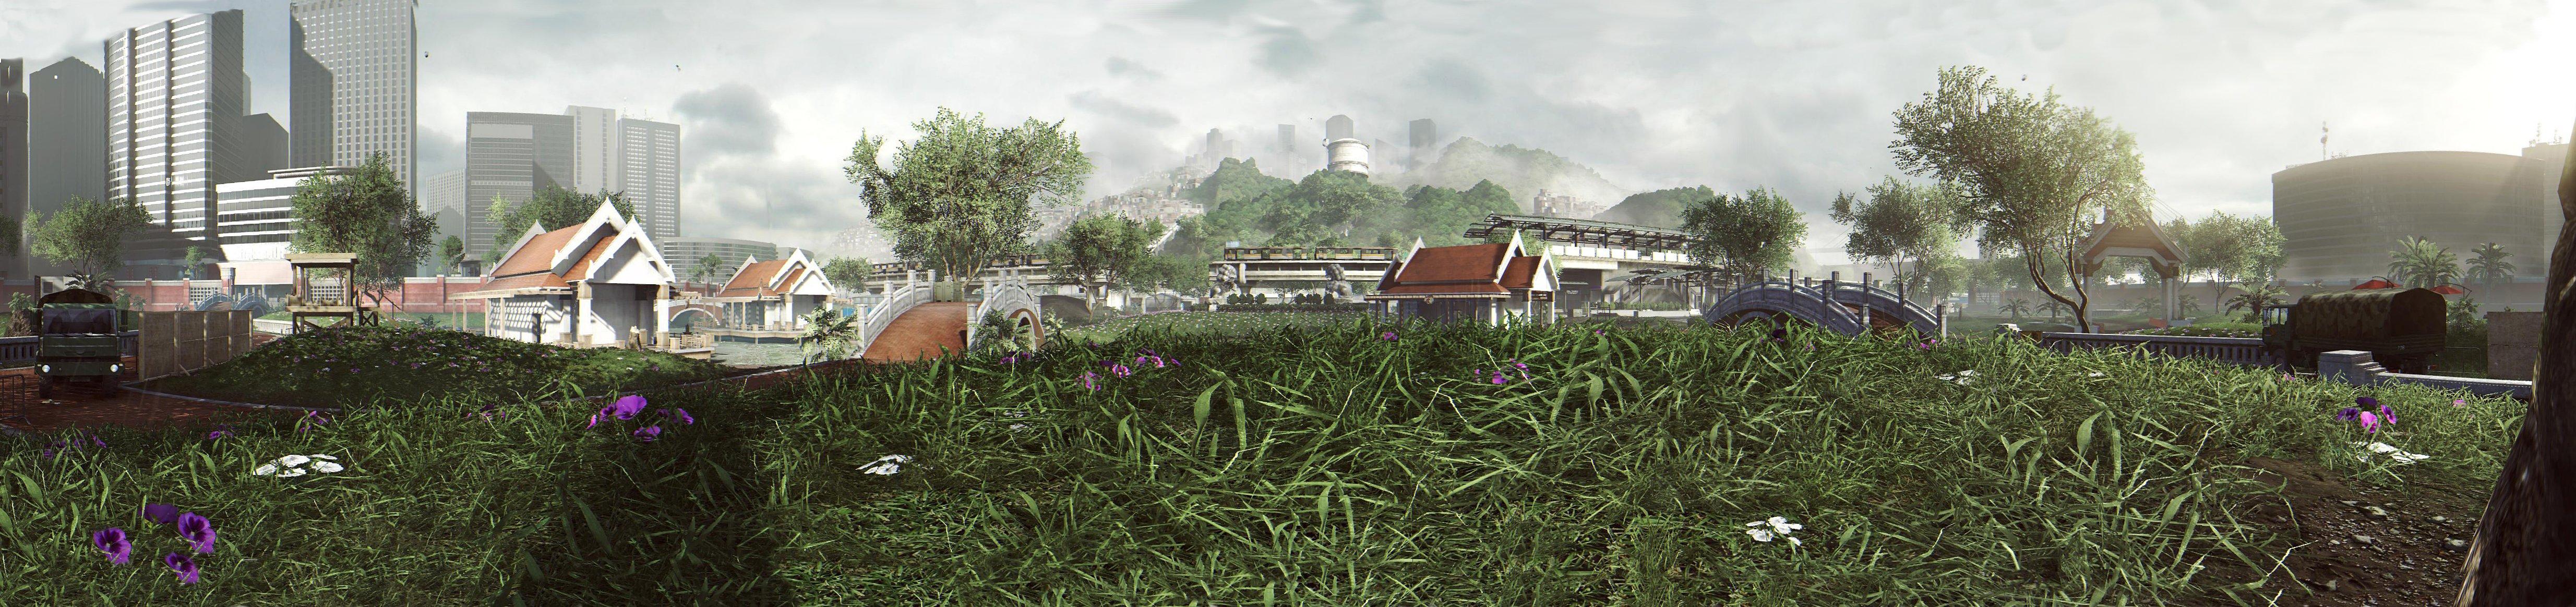 Battlefield 4 Dragon's Teeth в широком формате (панорама). - Изображение 3